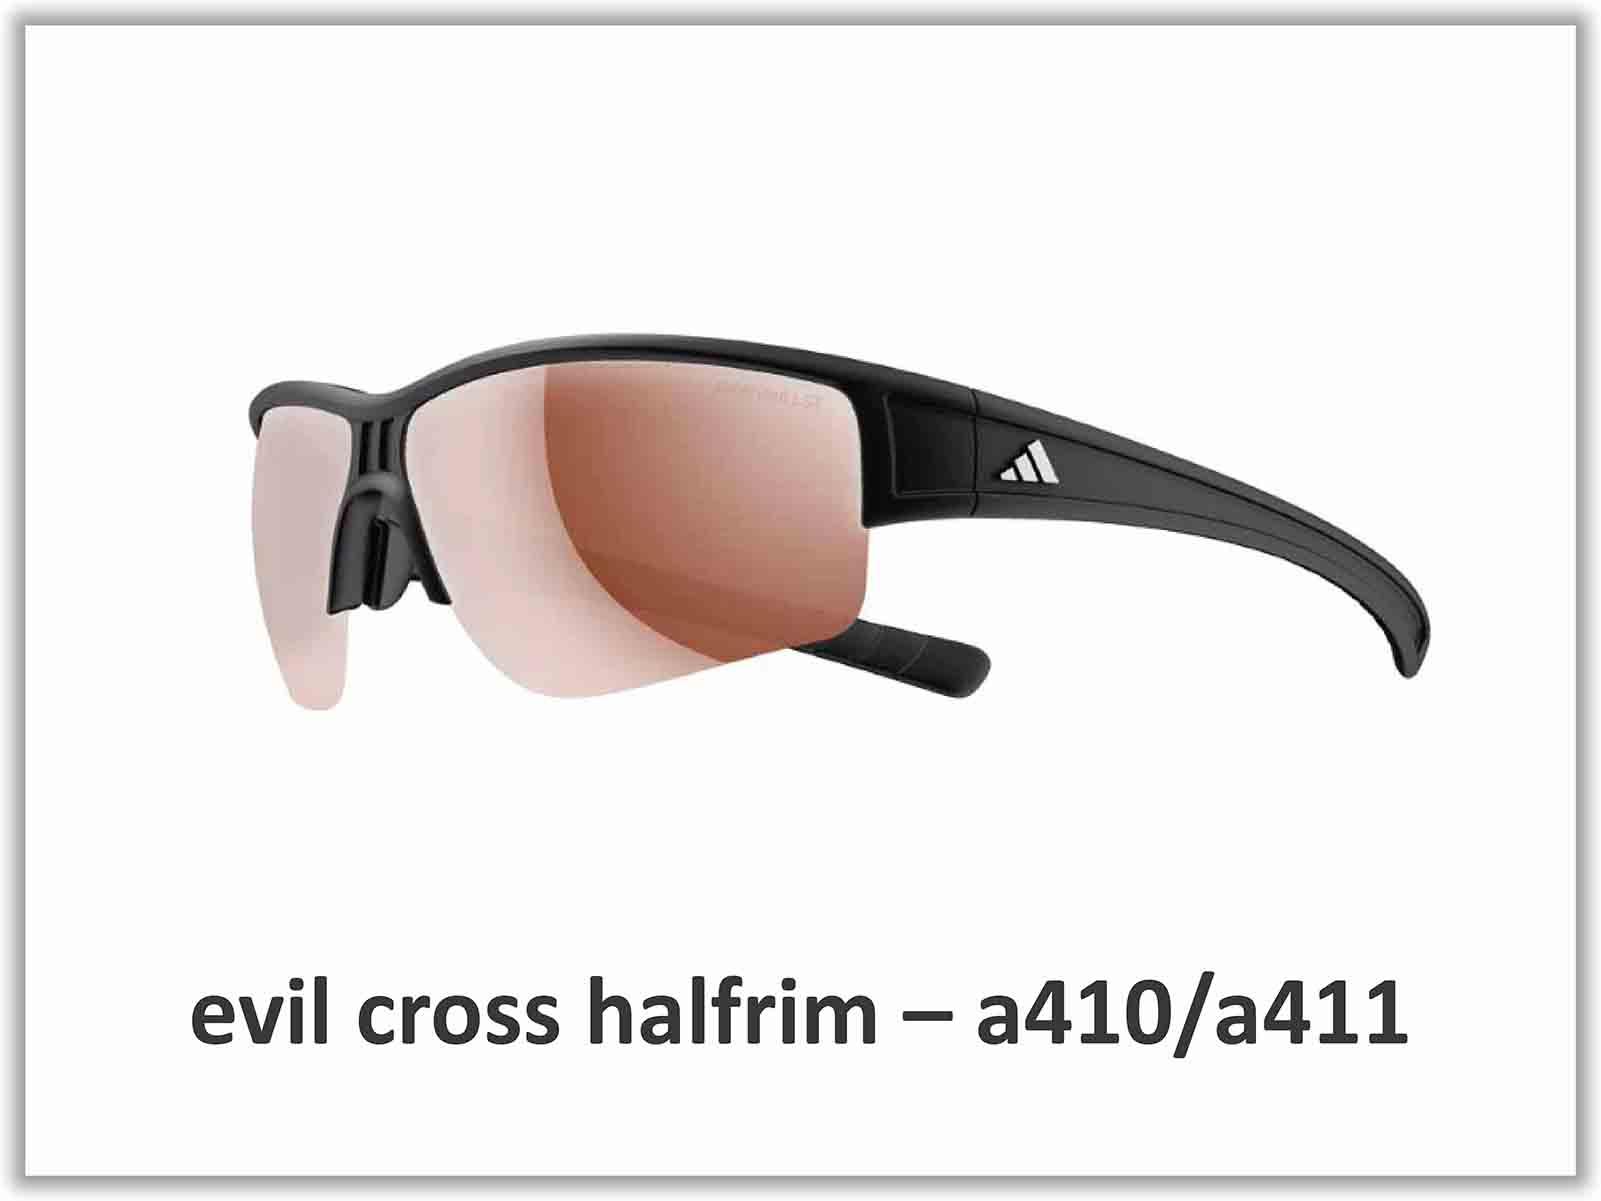 evil cross halfrim – a410/a411